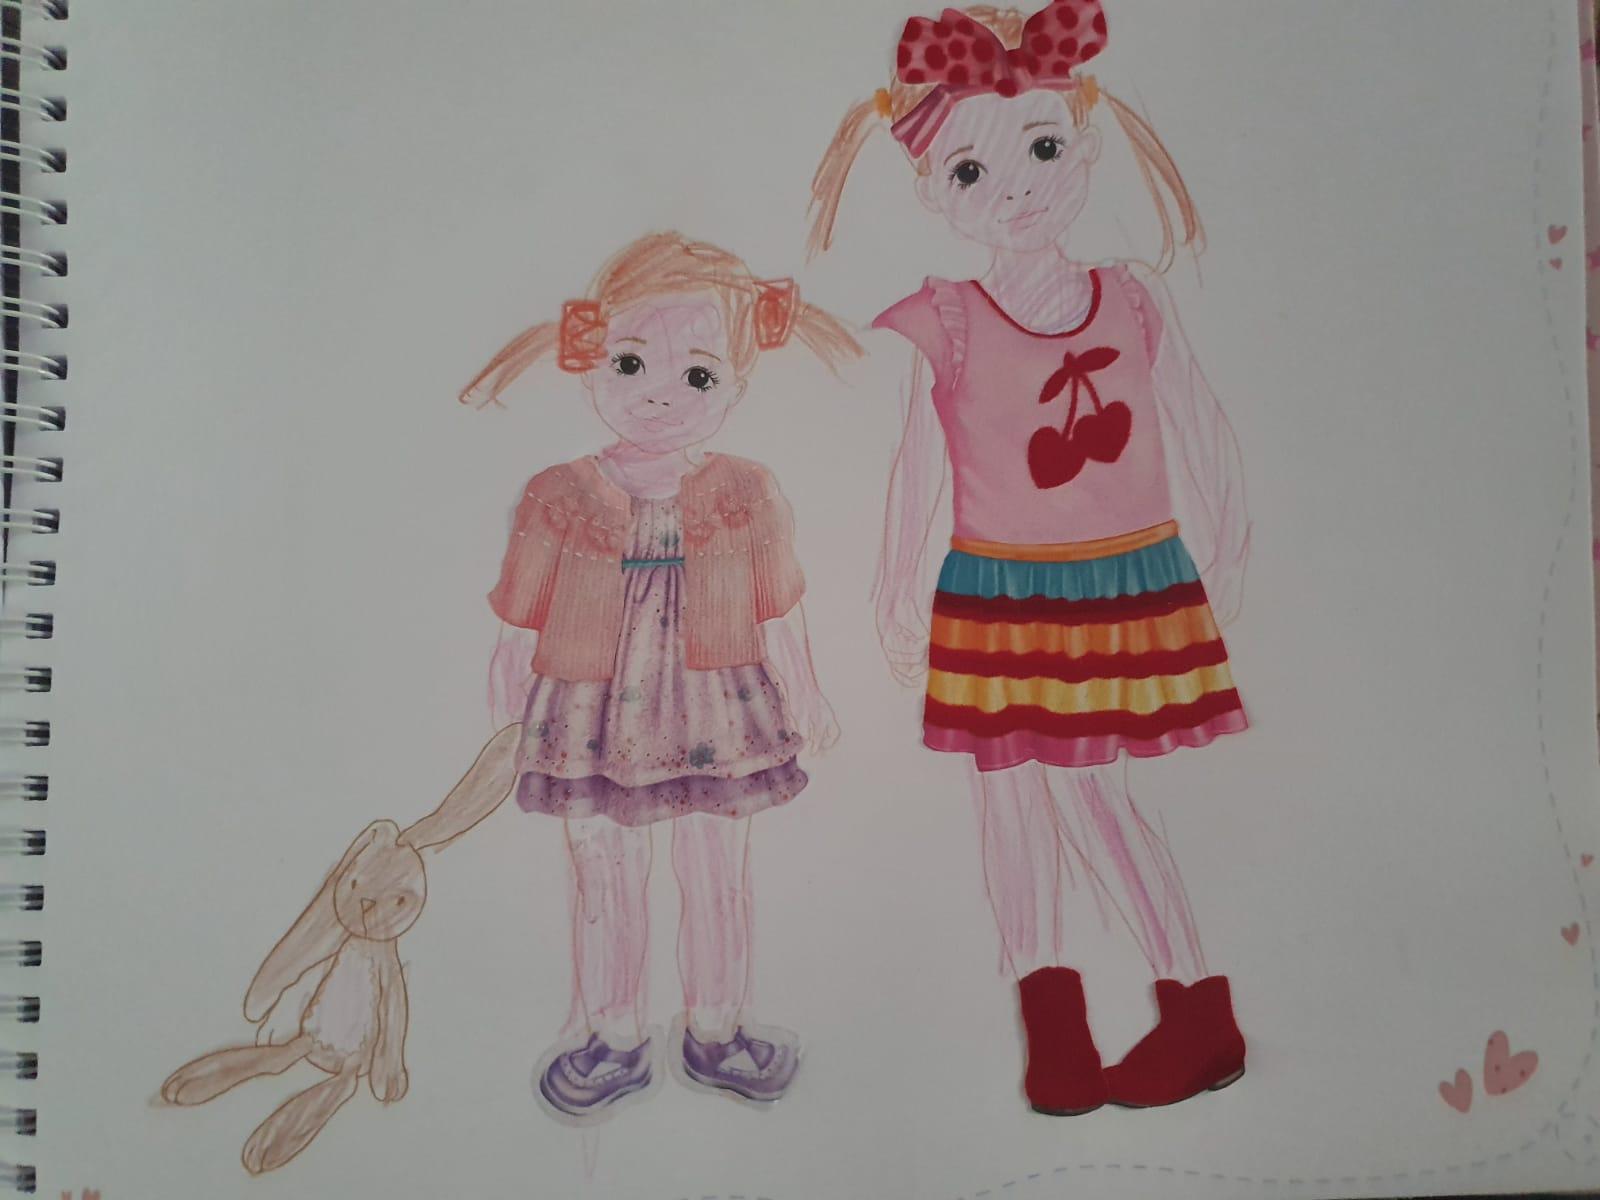 Enora O., 6 Jahre, aus Clermont-Ferrand